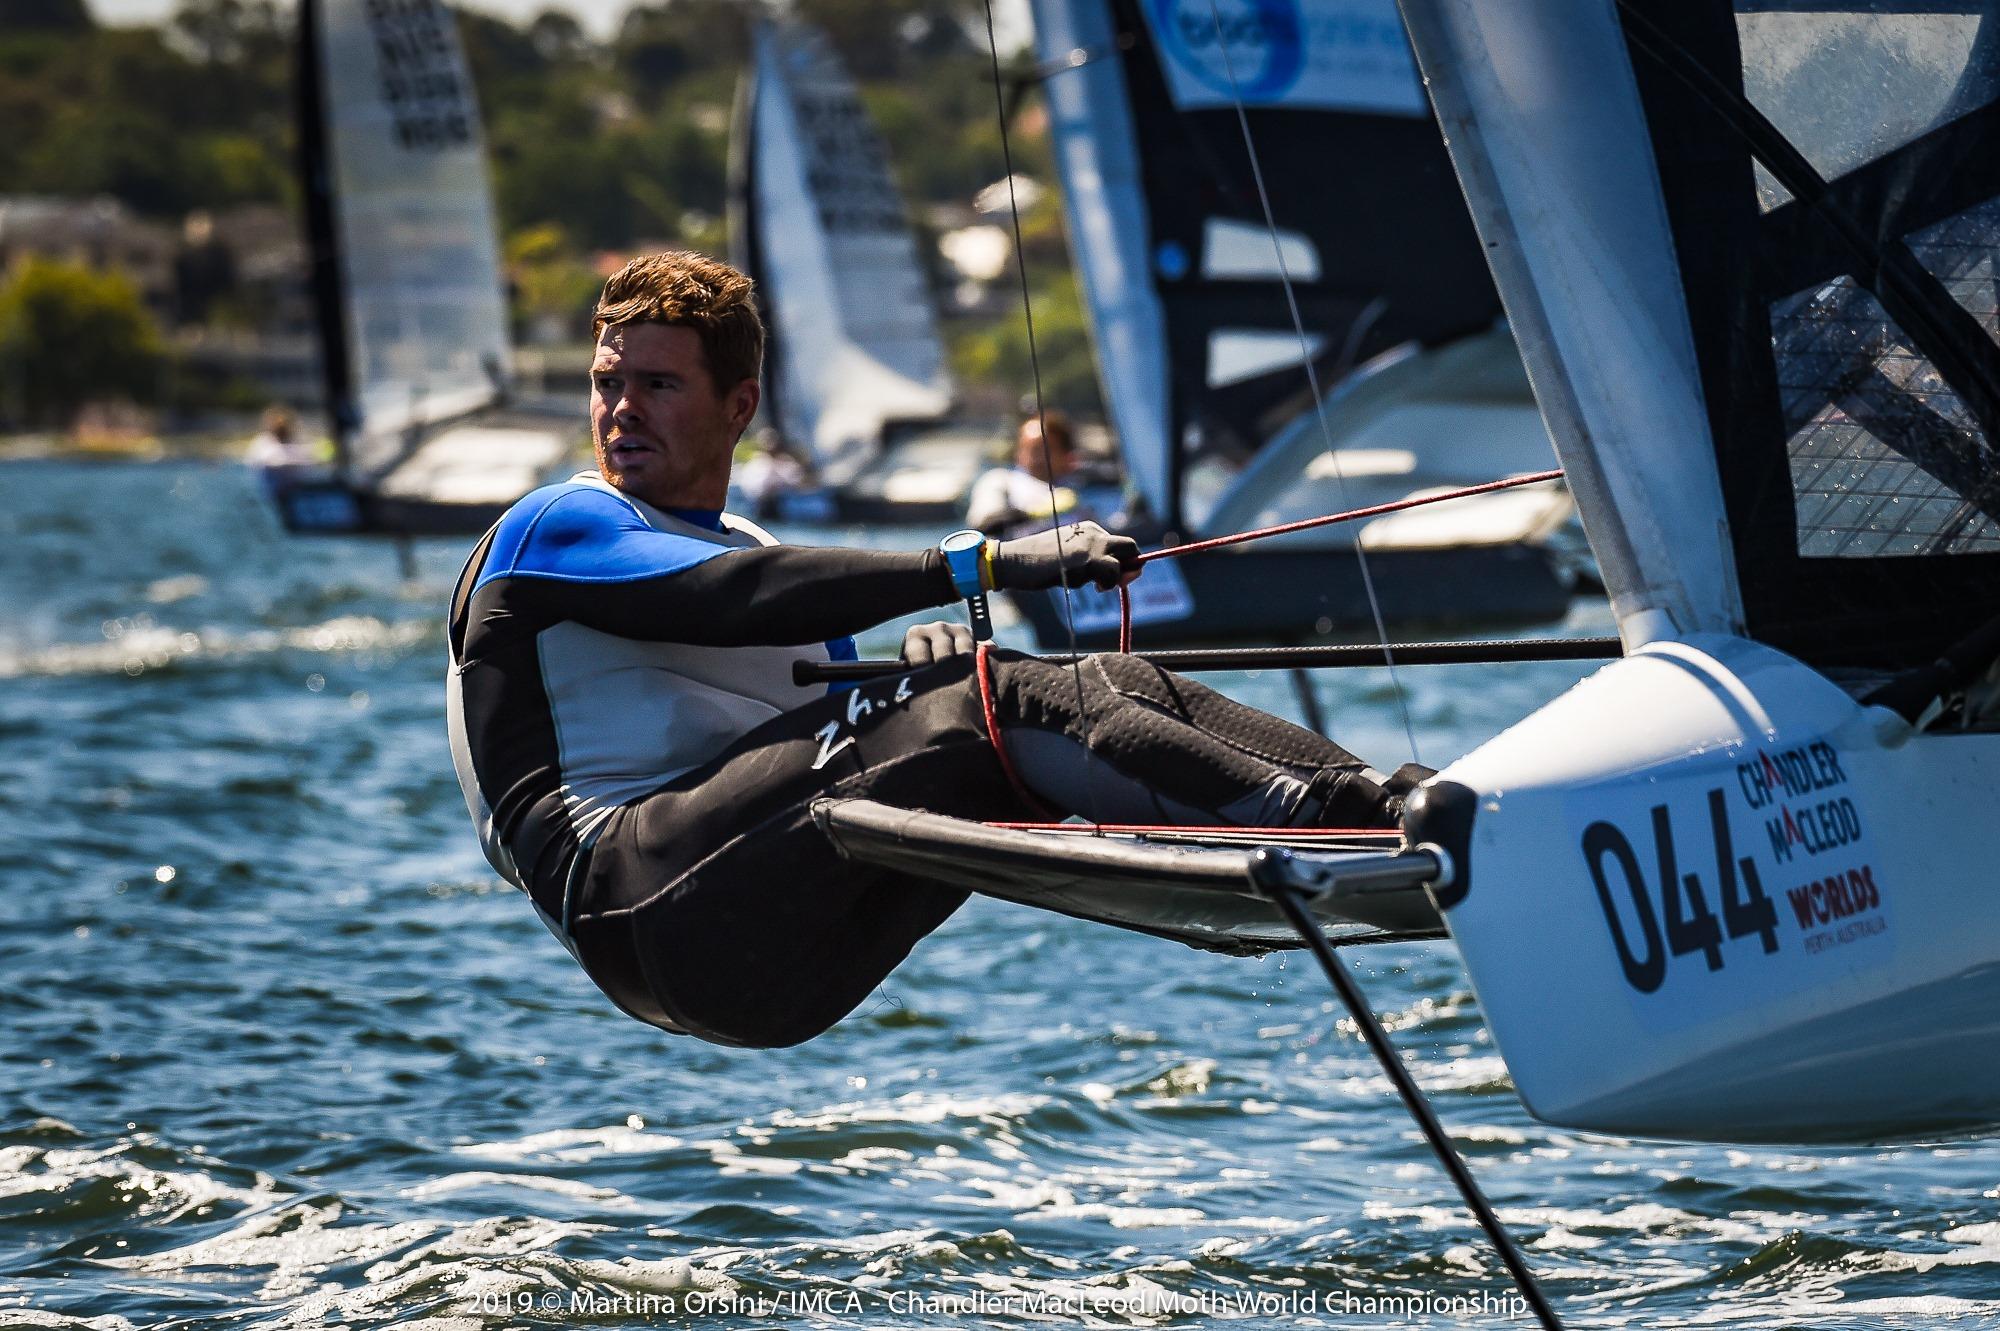 New Australian National champion Tom Slingsby leads - Martina Orsini pic